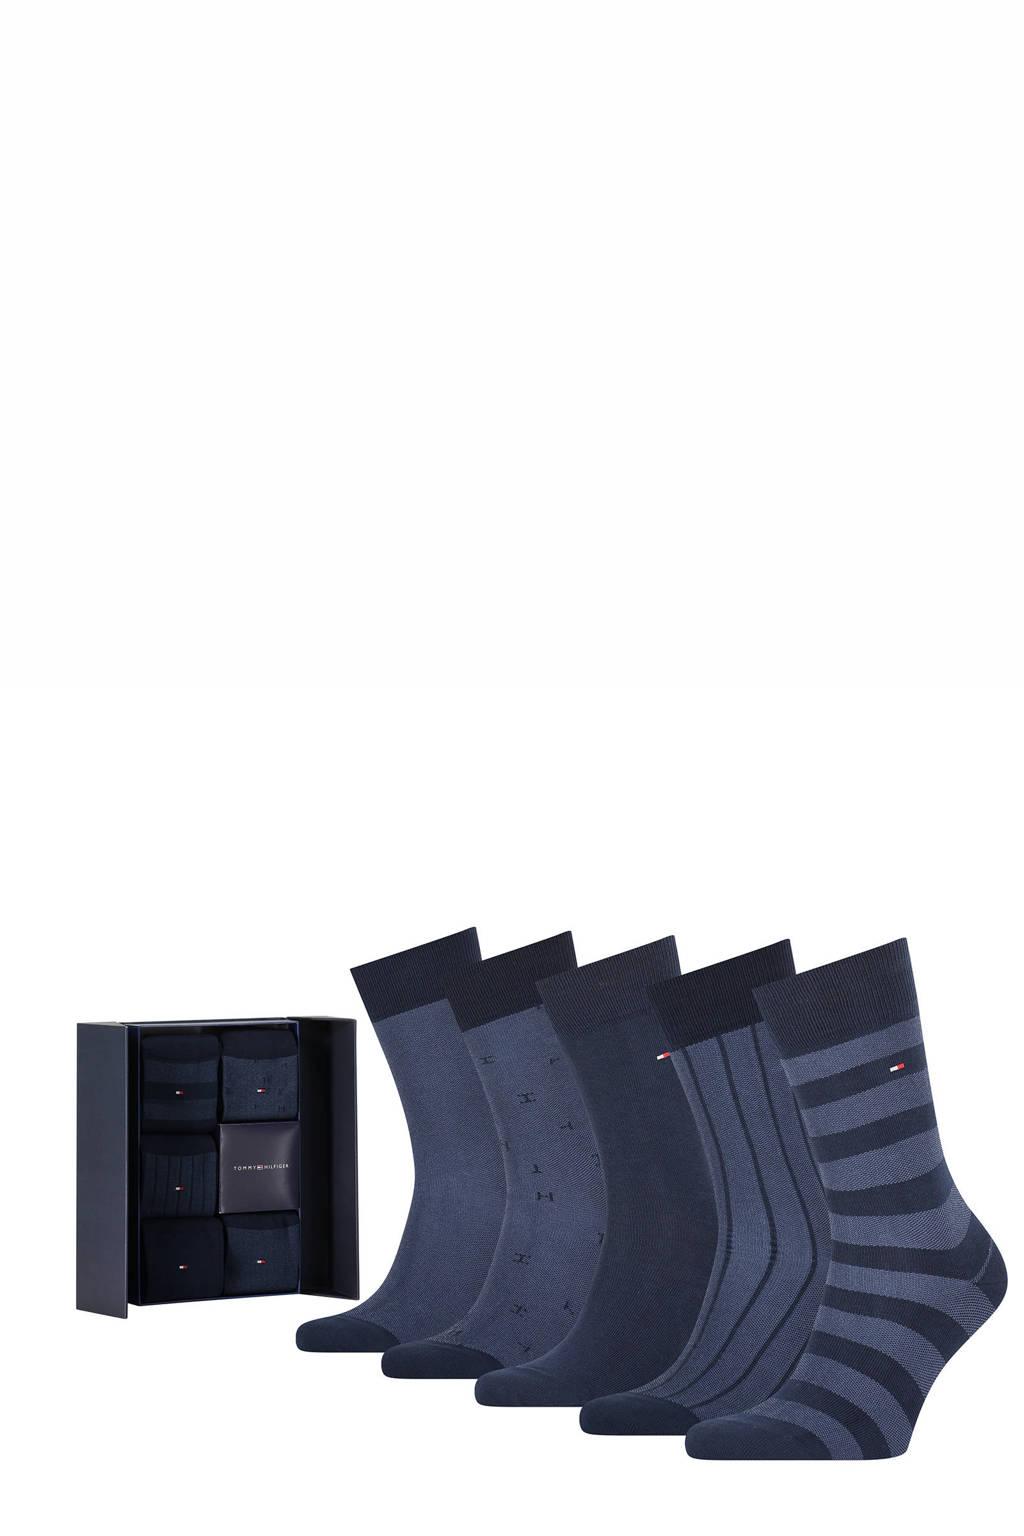 Tommy Hilfiger giftbox sokken - set van 5 donkerblauw, Donkerblauw